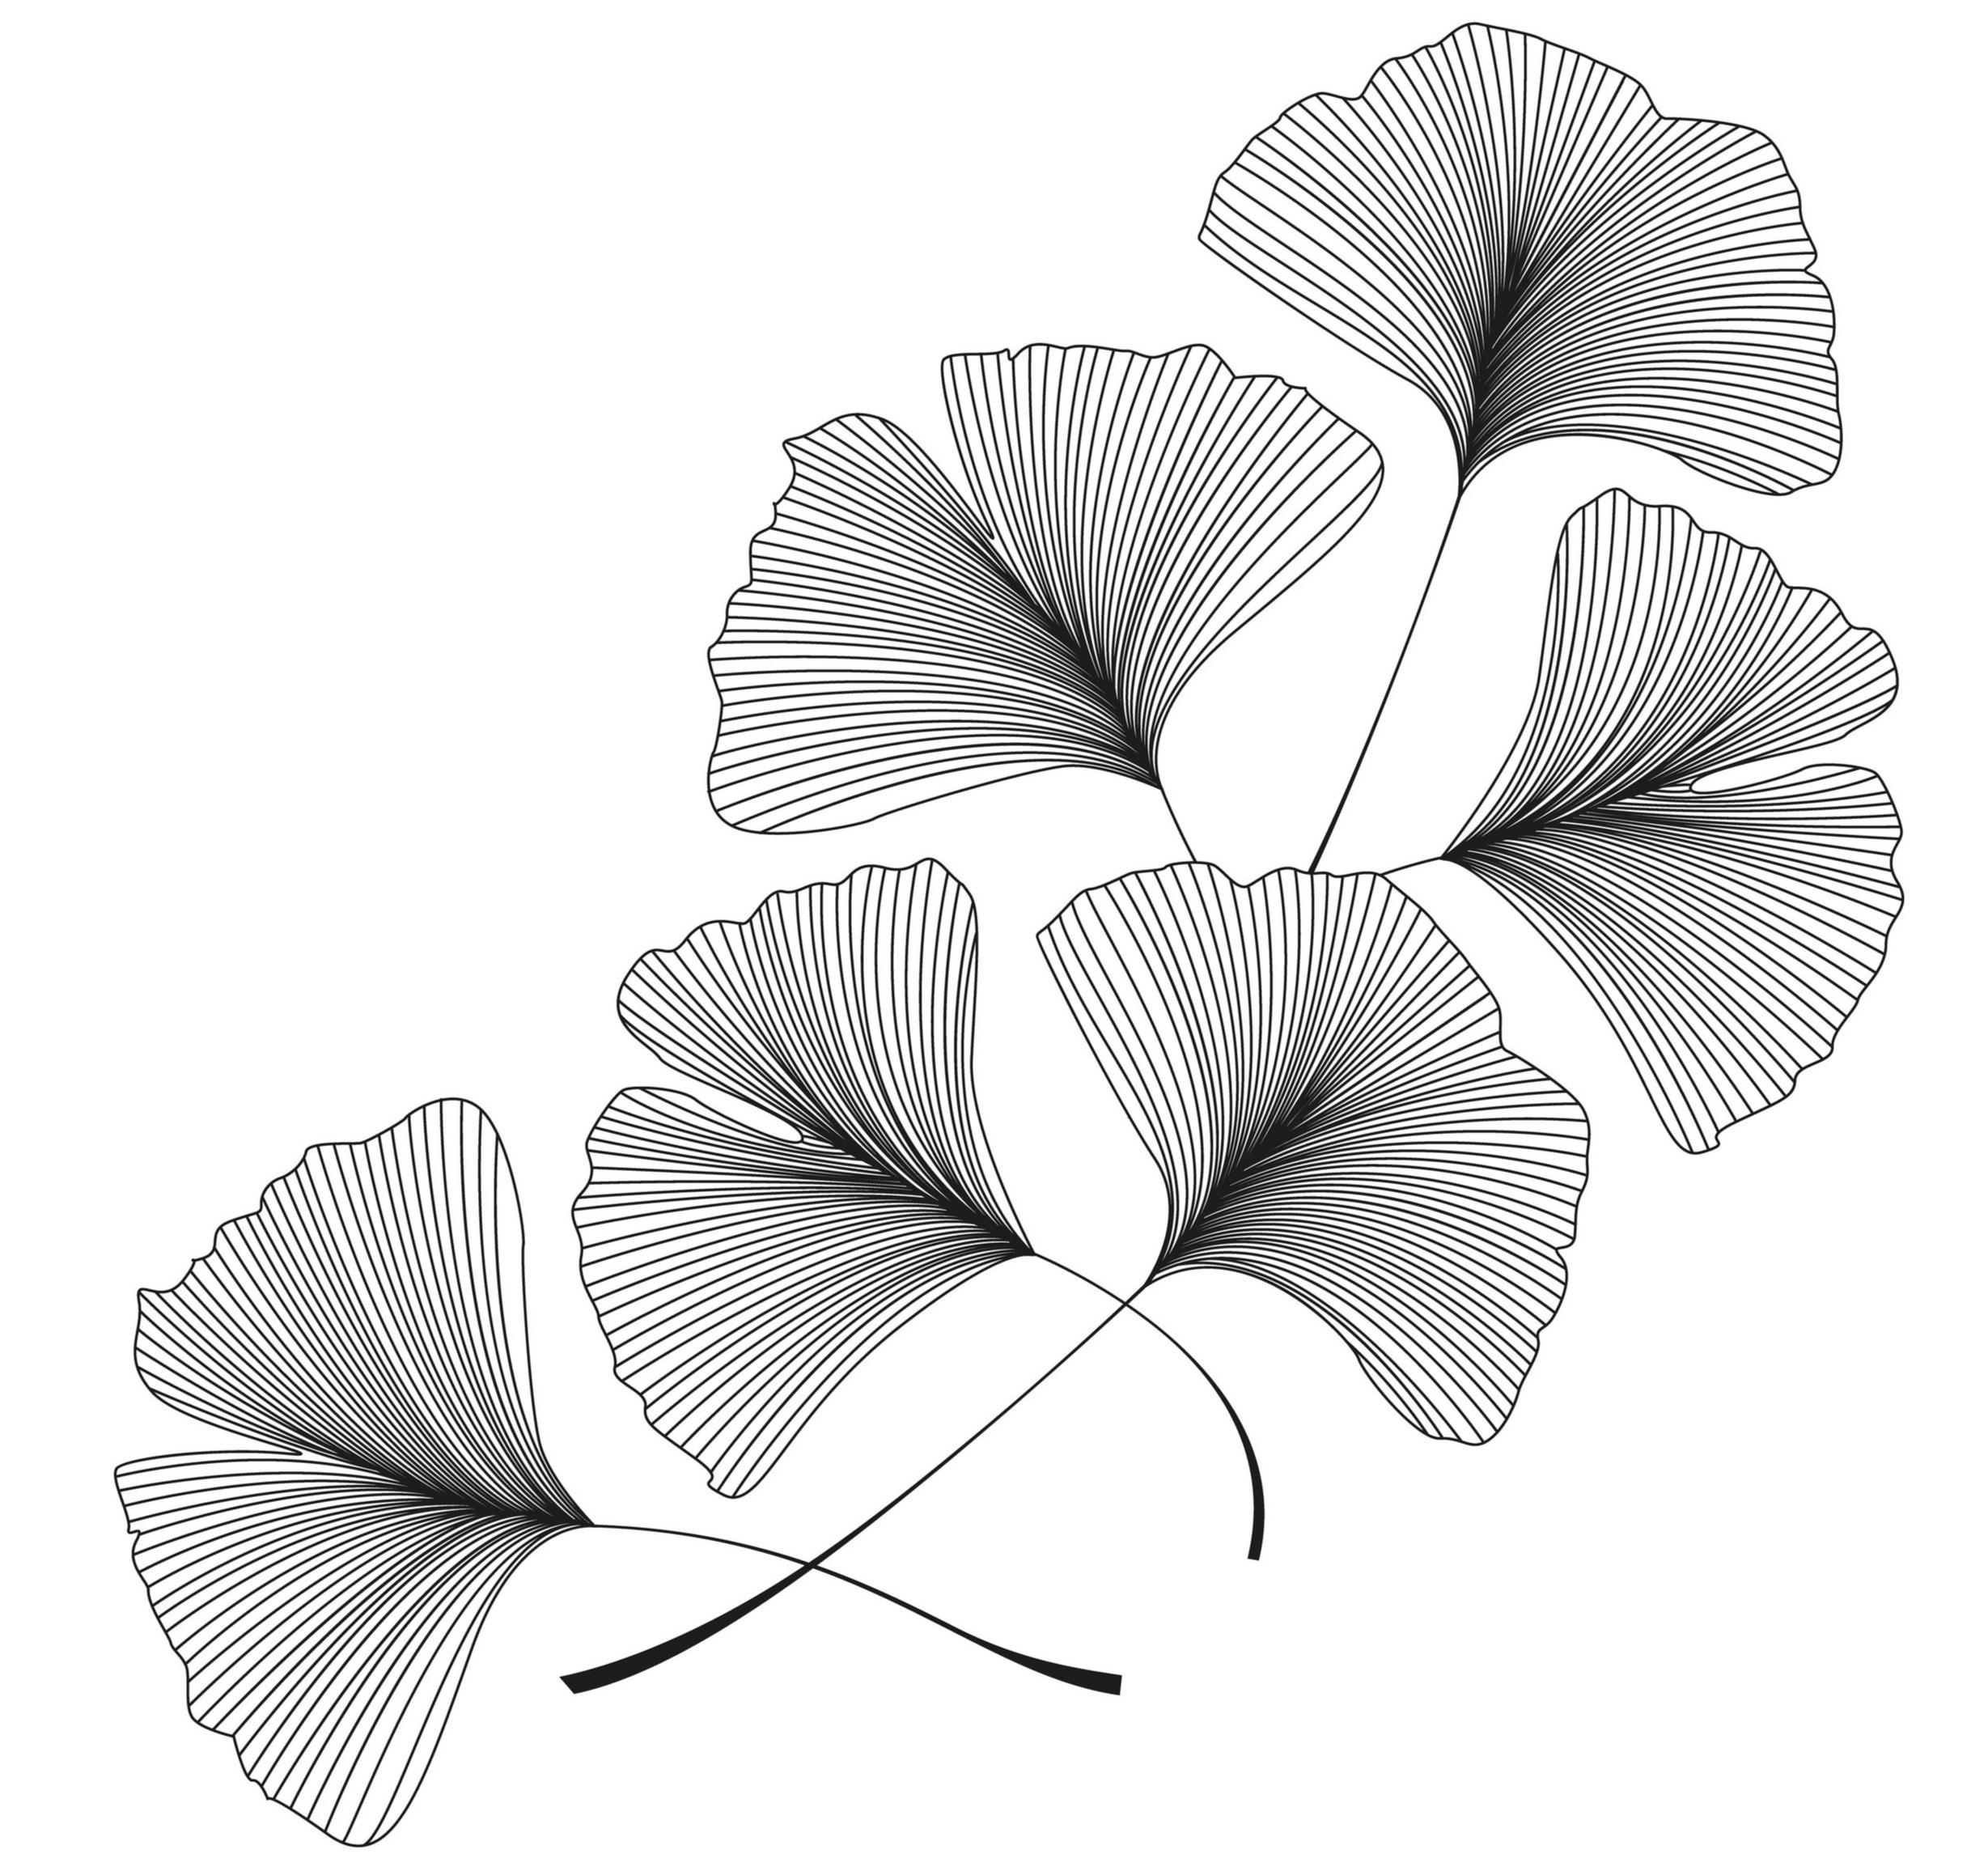 Ginkgo leaves art by Miroslava Hlavacova